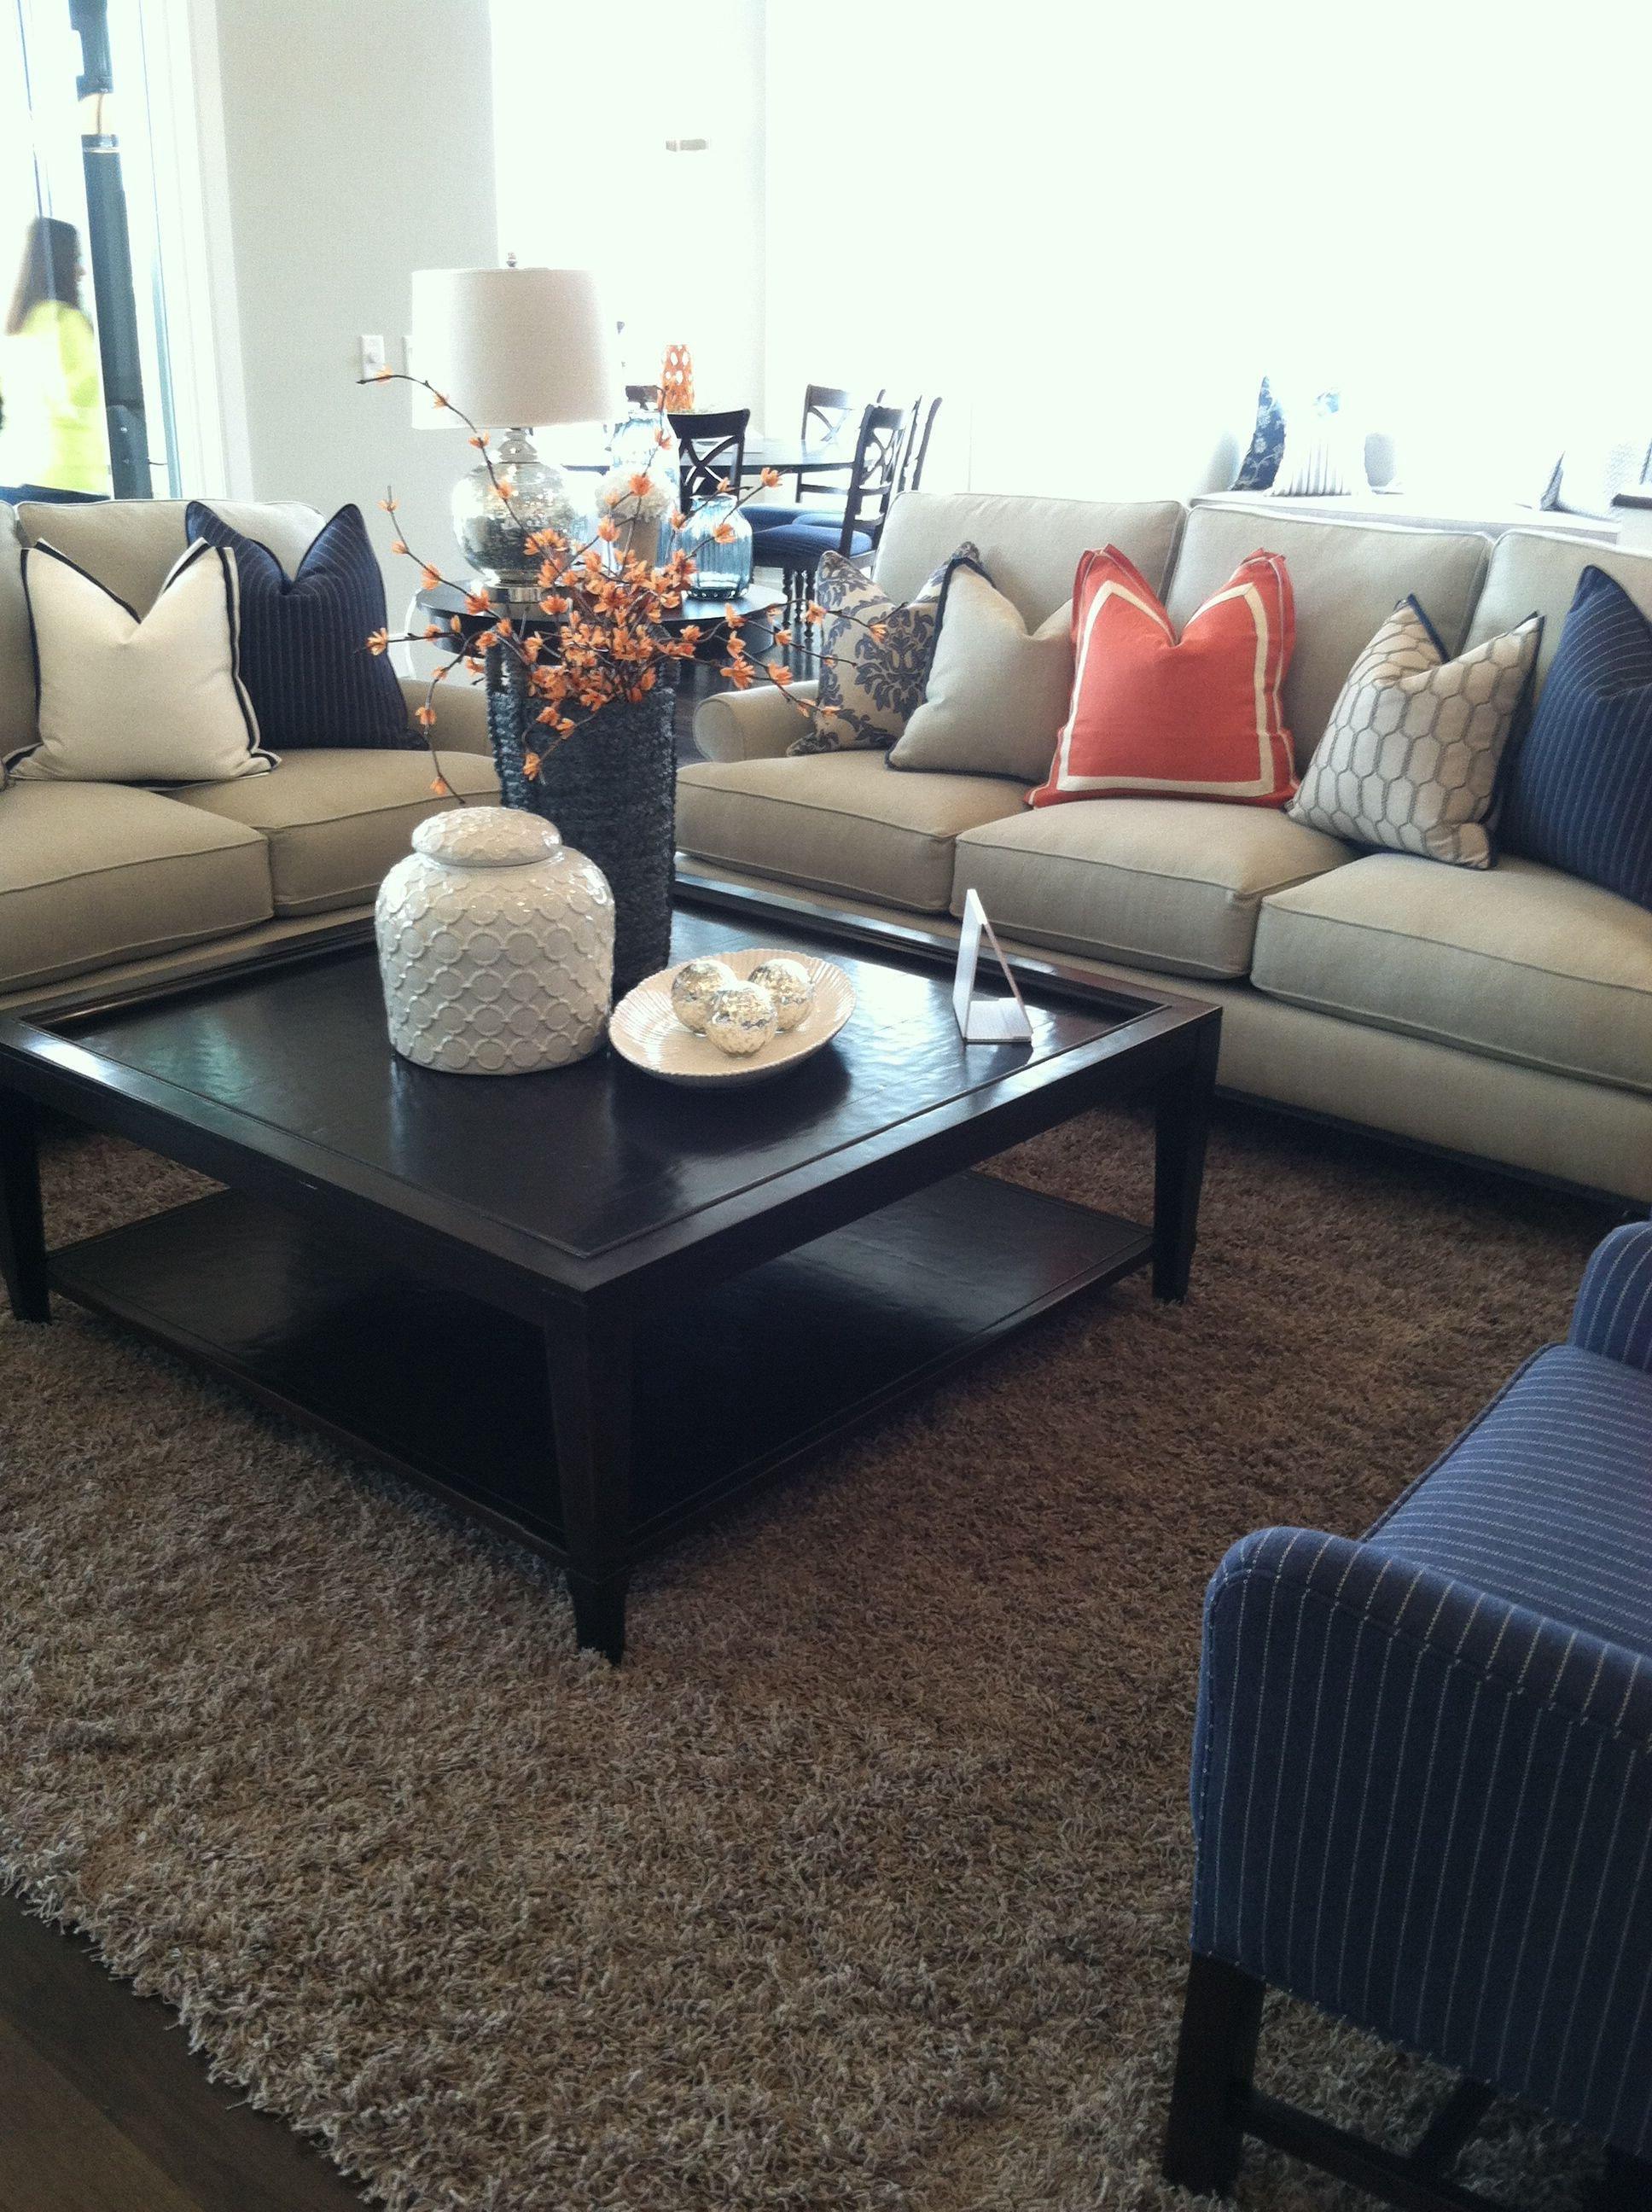 Navy Blue Living Room Decor Elegant orange and Navy Blue Accent for Family Room Looks so